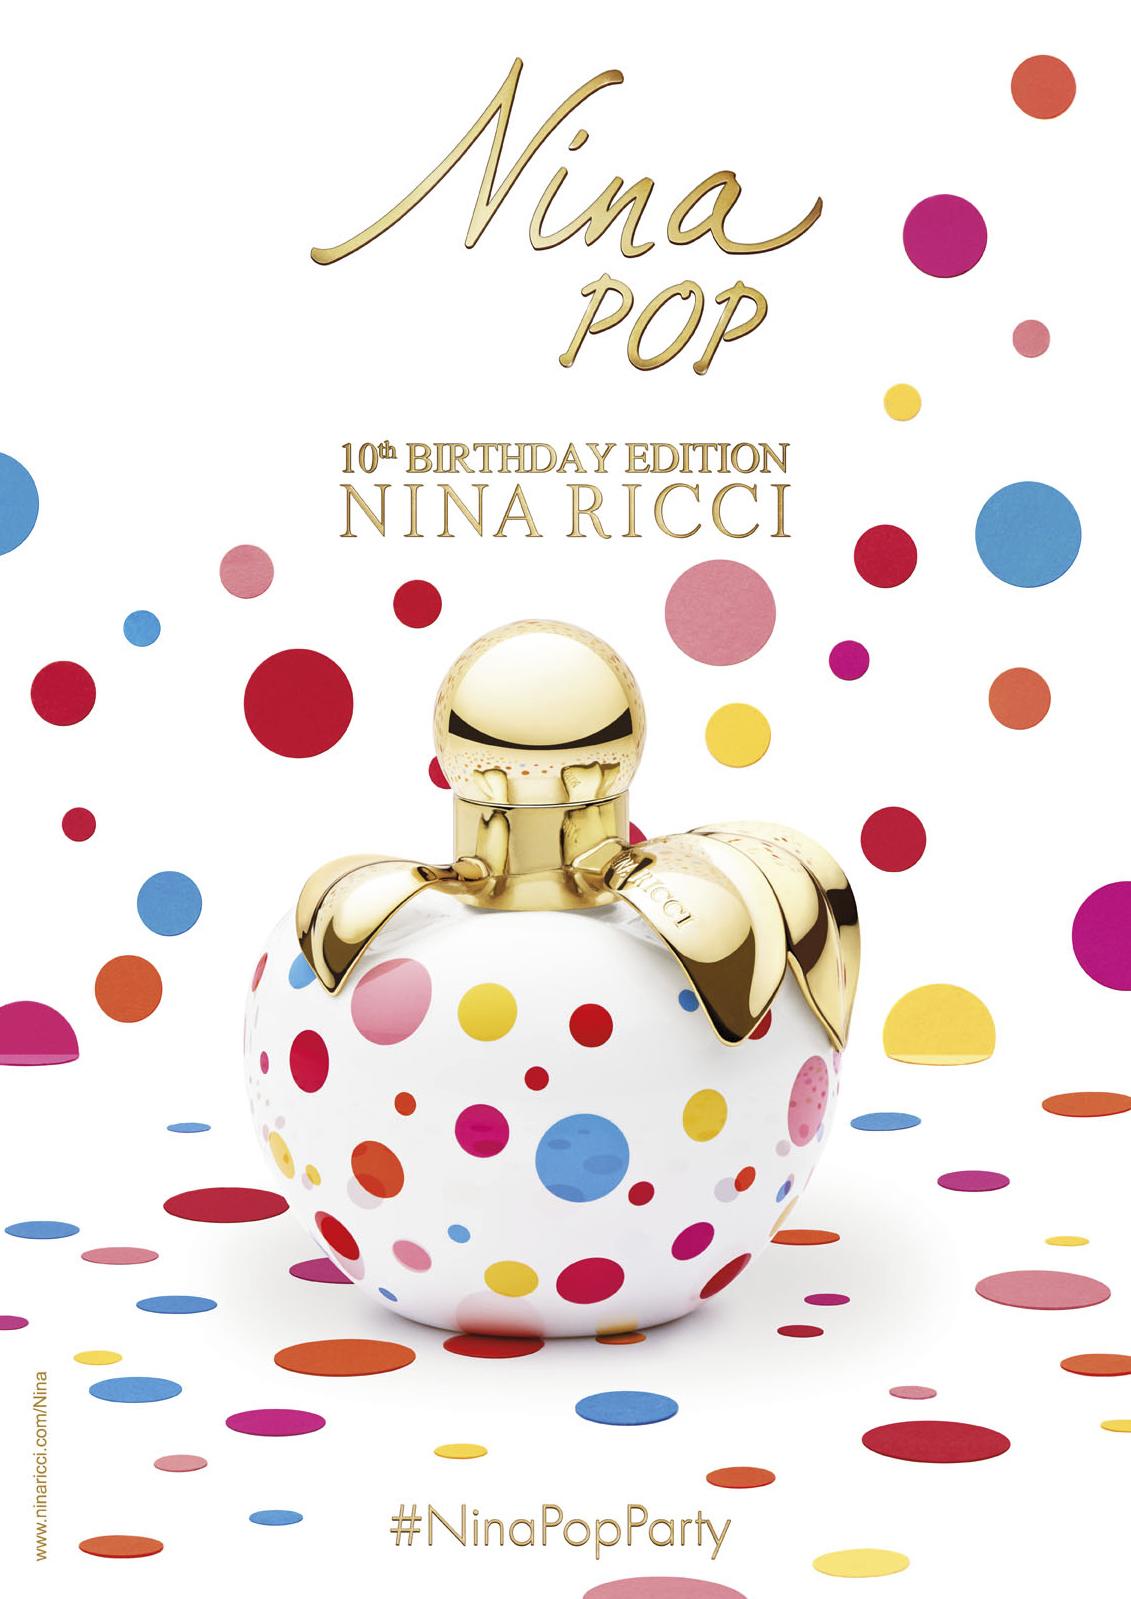 "Nina Ricci ""Nina Pop"" Fragrance Campaign | Michelangelo di Battista | Nina Ricci | Gioia | Nadia Bonalumi | Numerique Retouch Photo Retouching Studio"